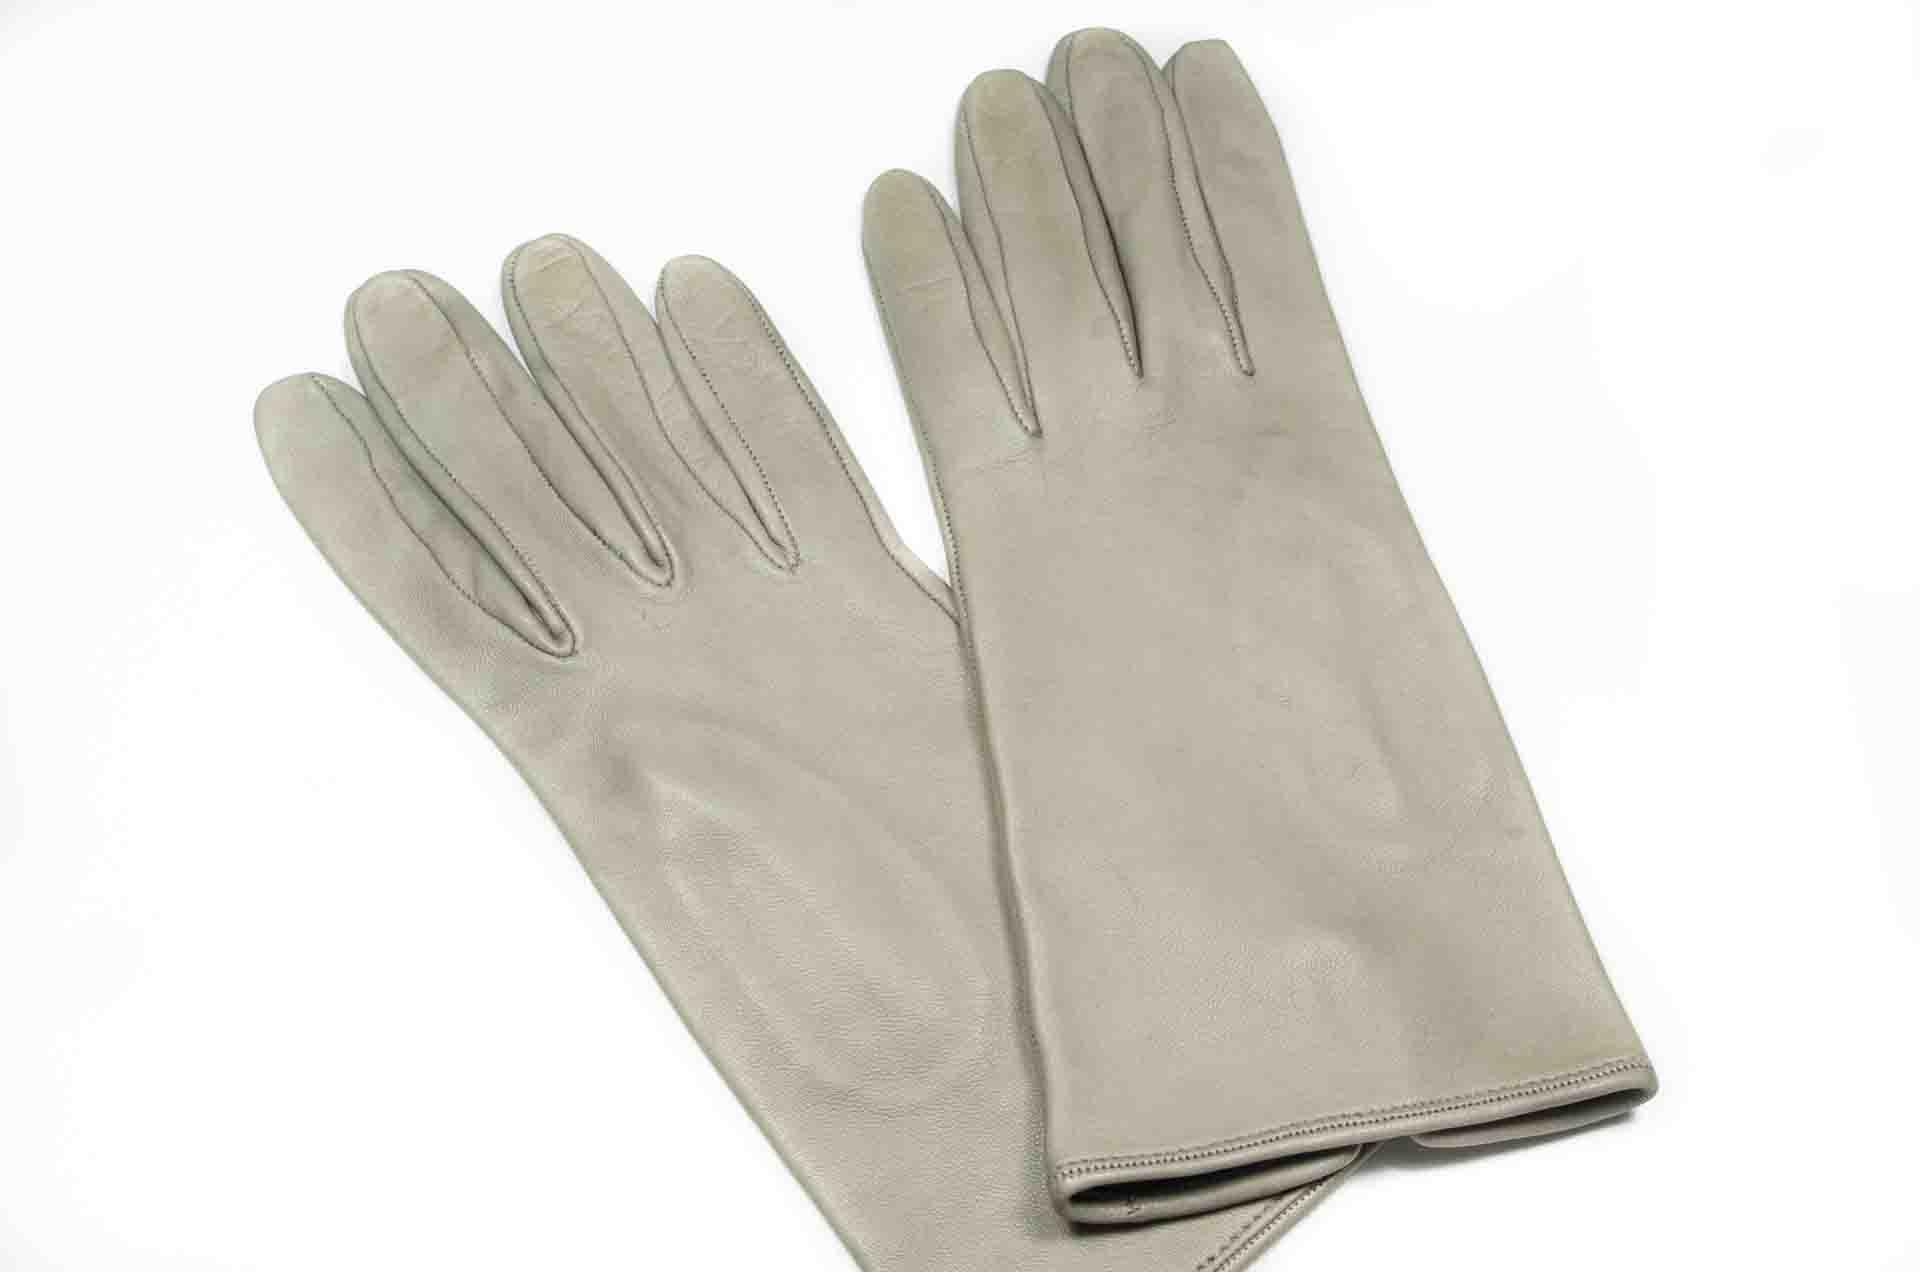 guanti in pelle grigi 1